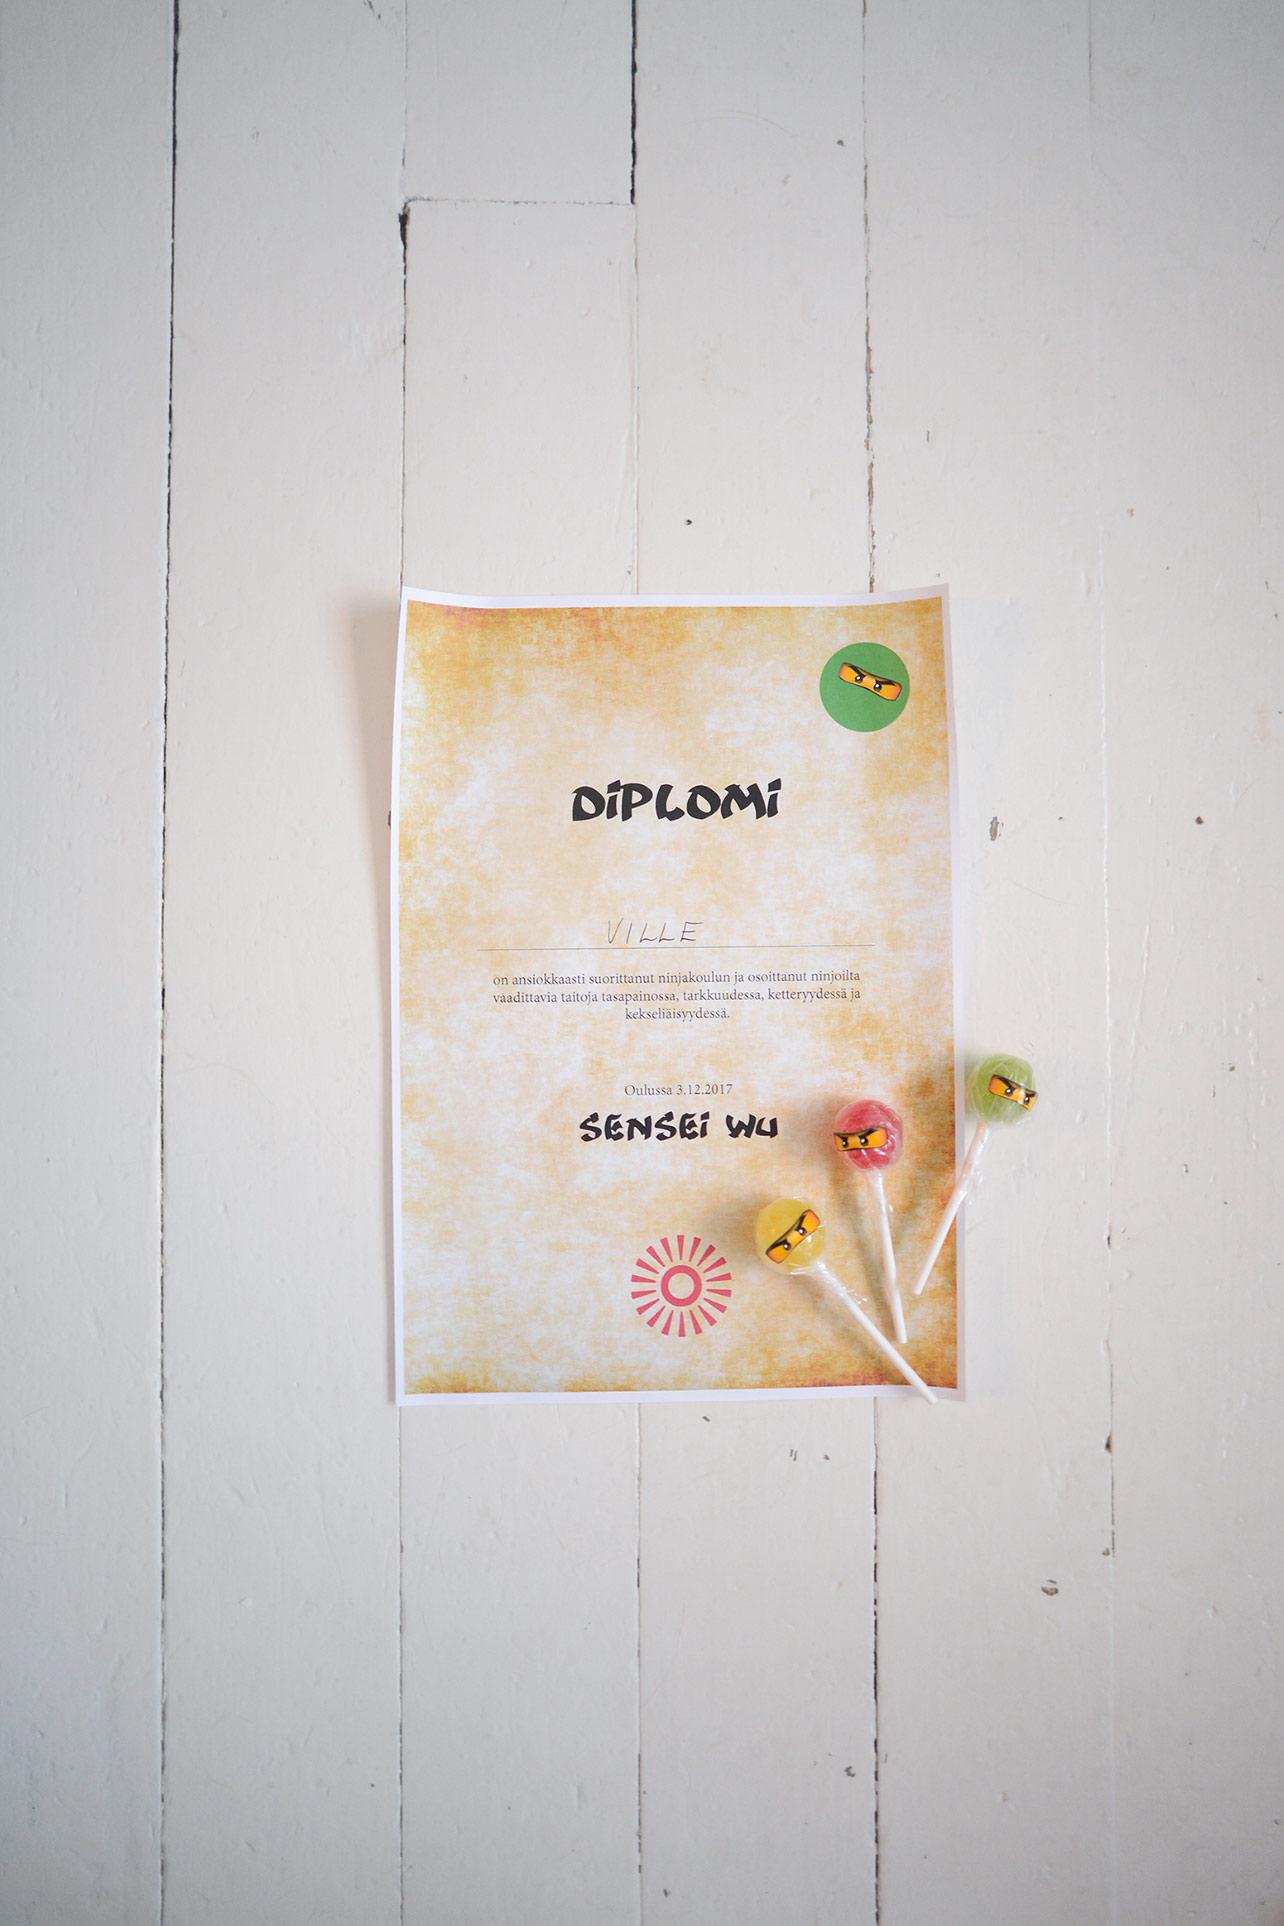 Ninja school diploma